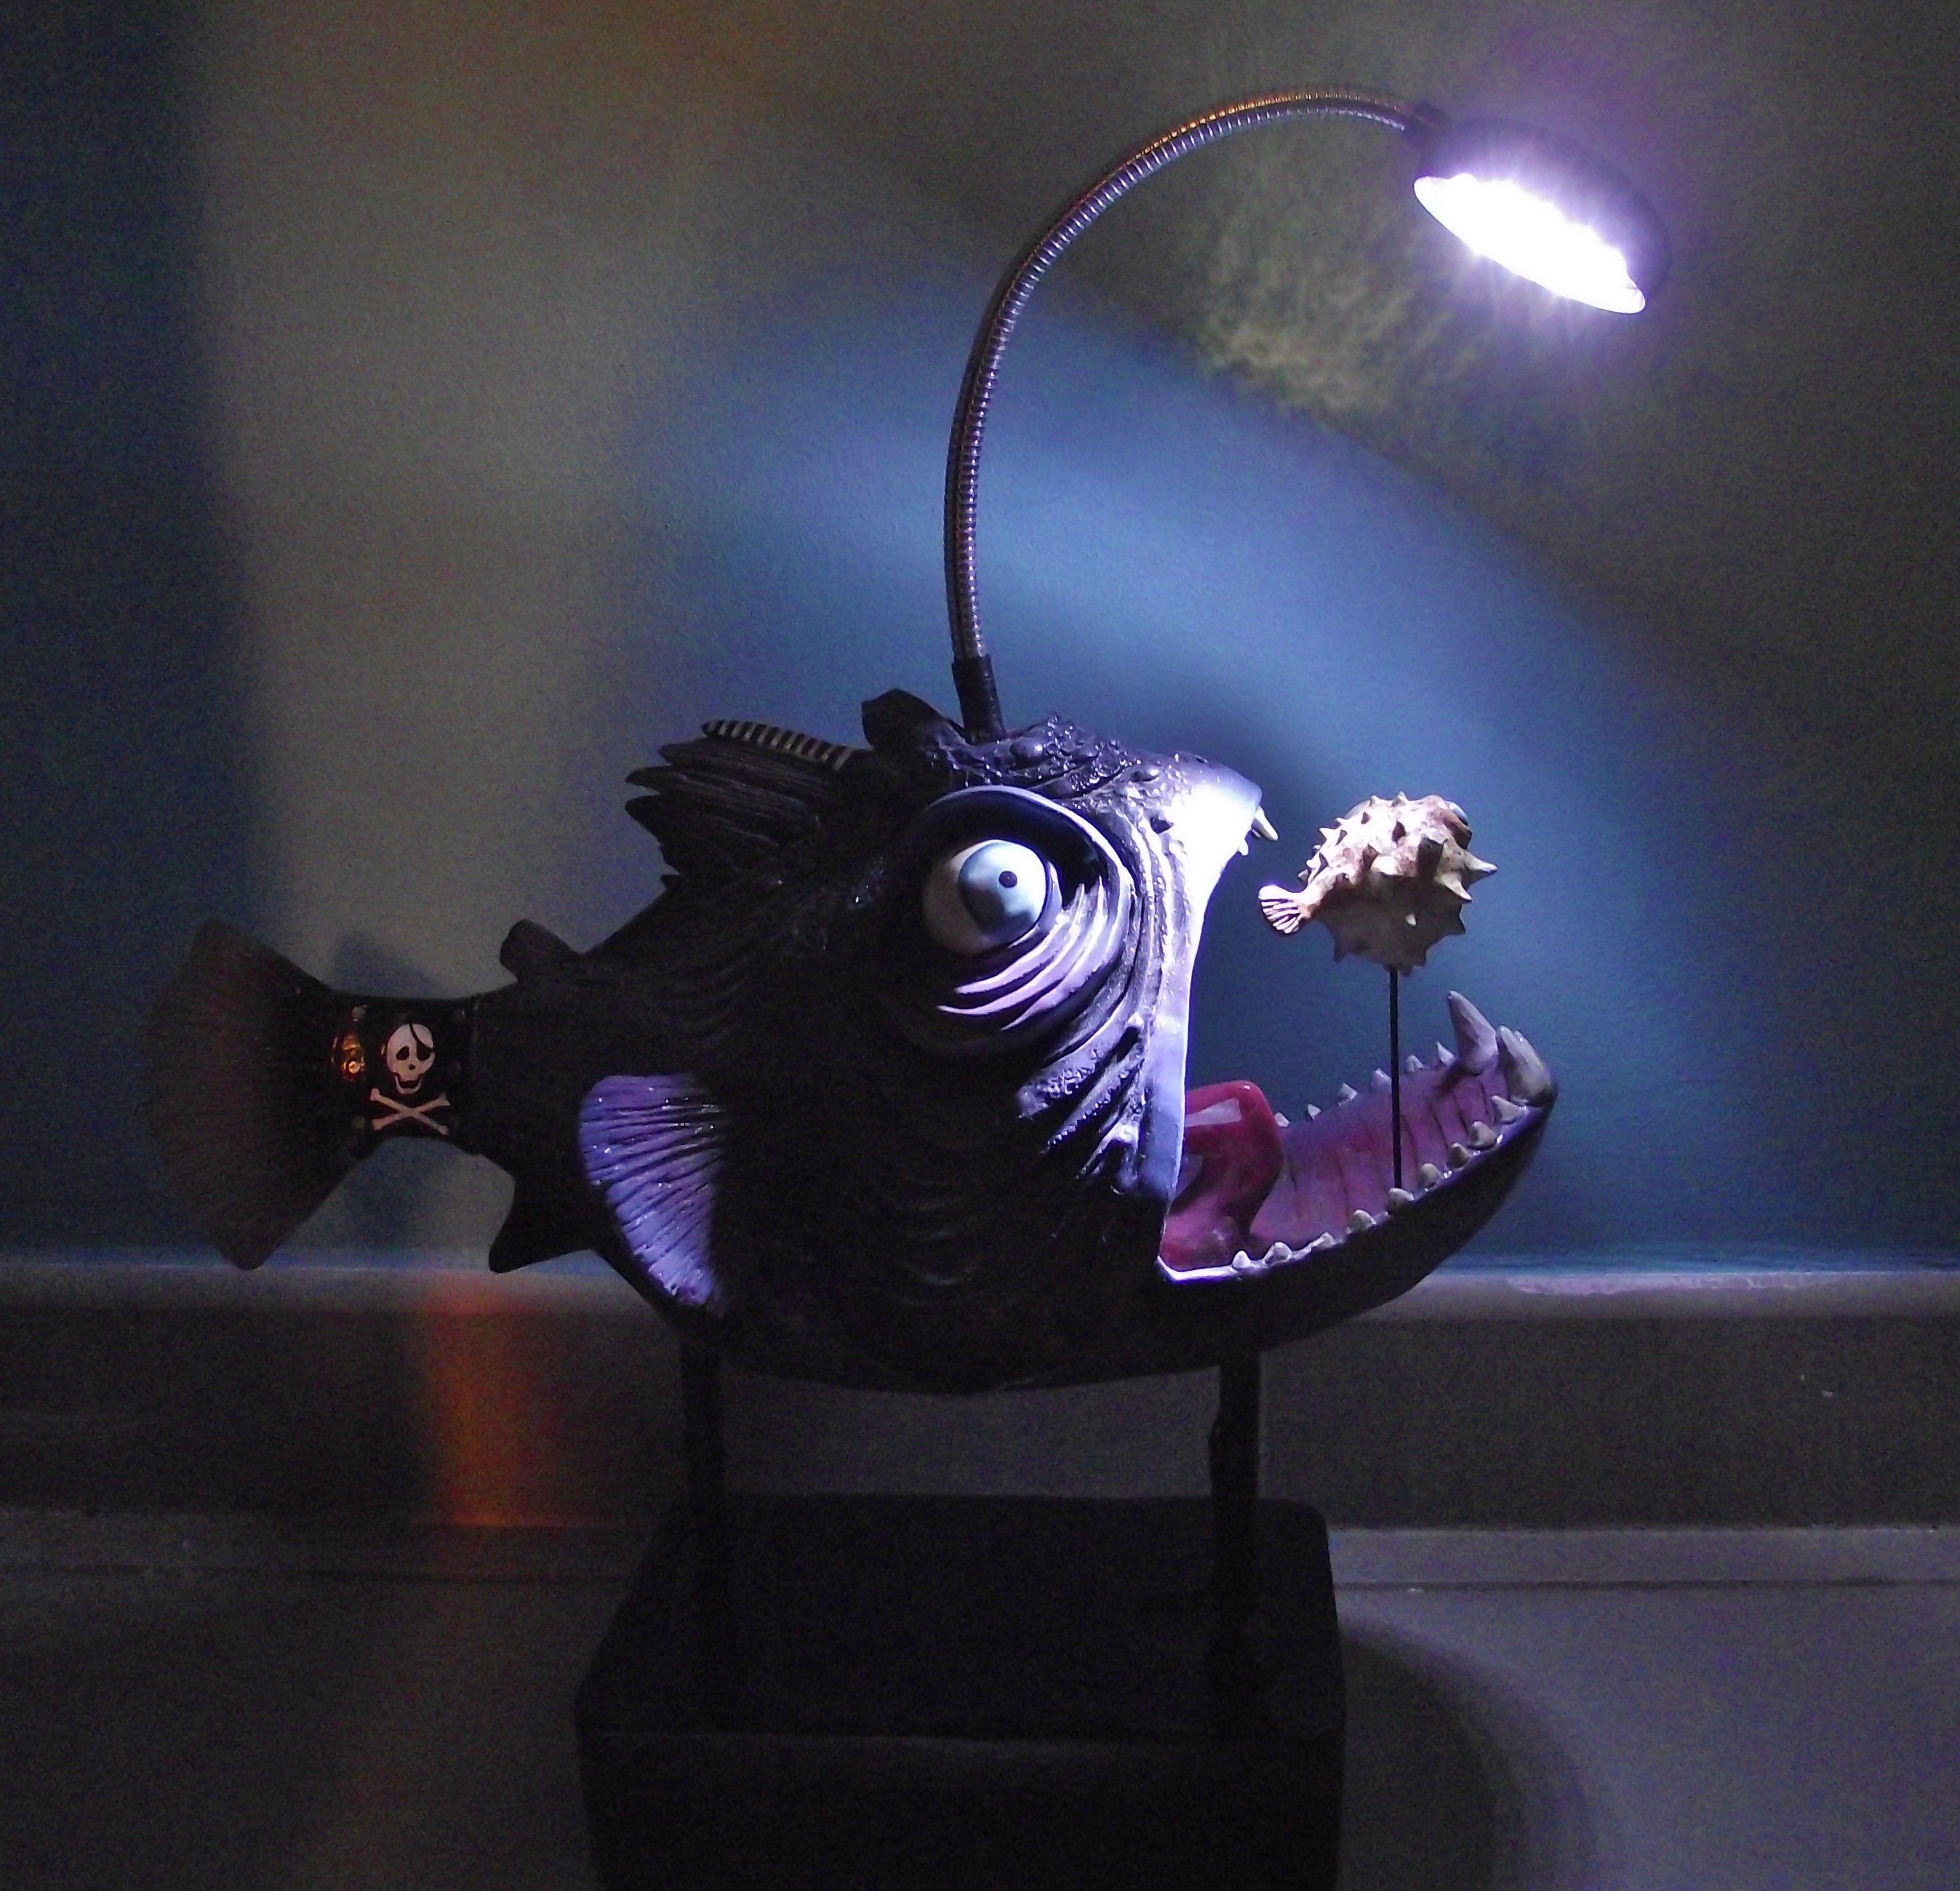 Poisson lanterne kris dufay cr ations croquis lanterne - Croquis poisson ...